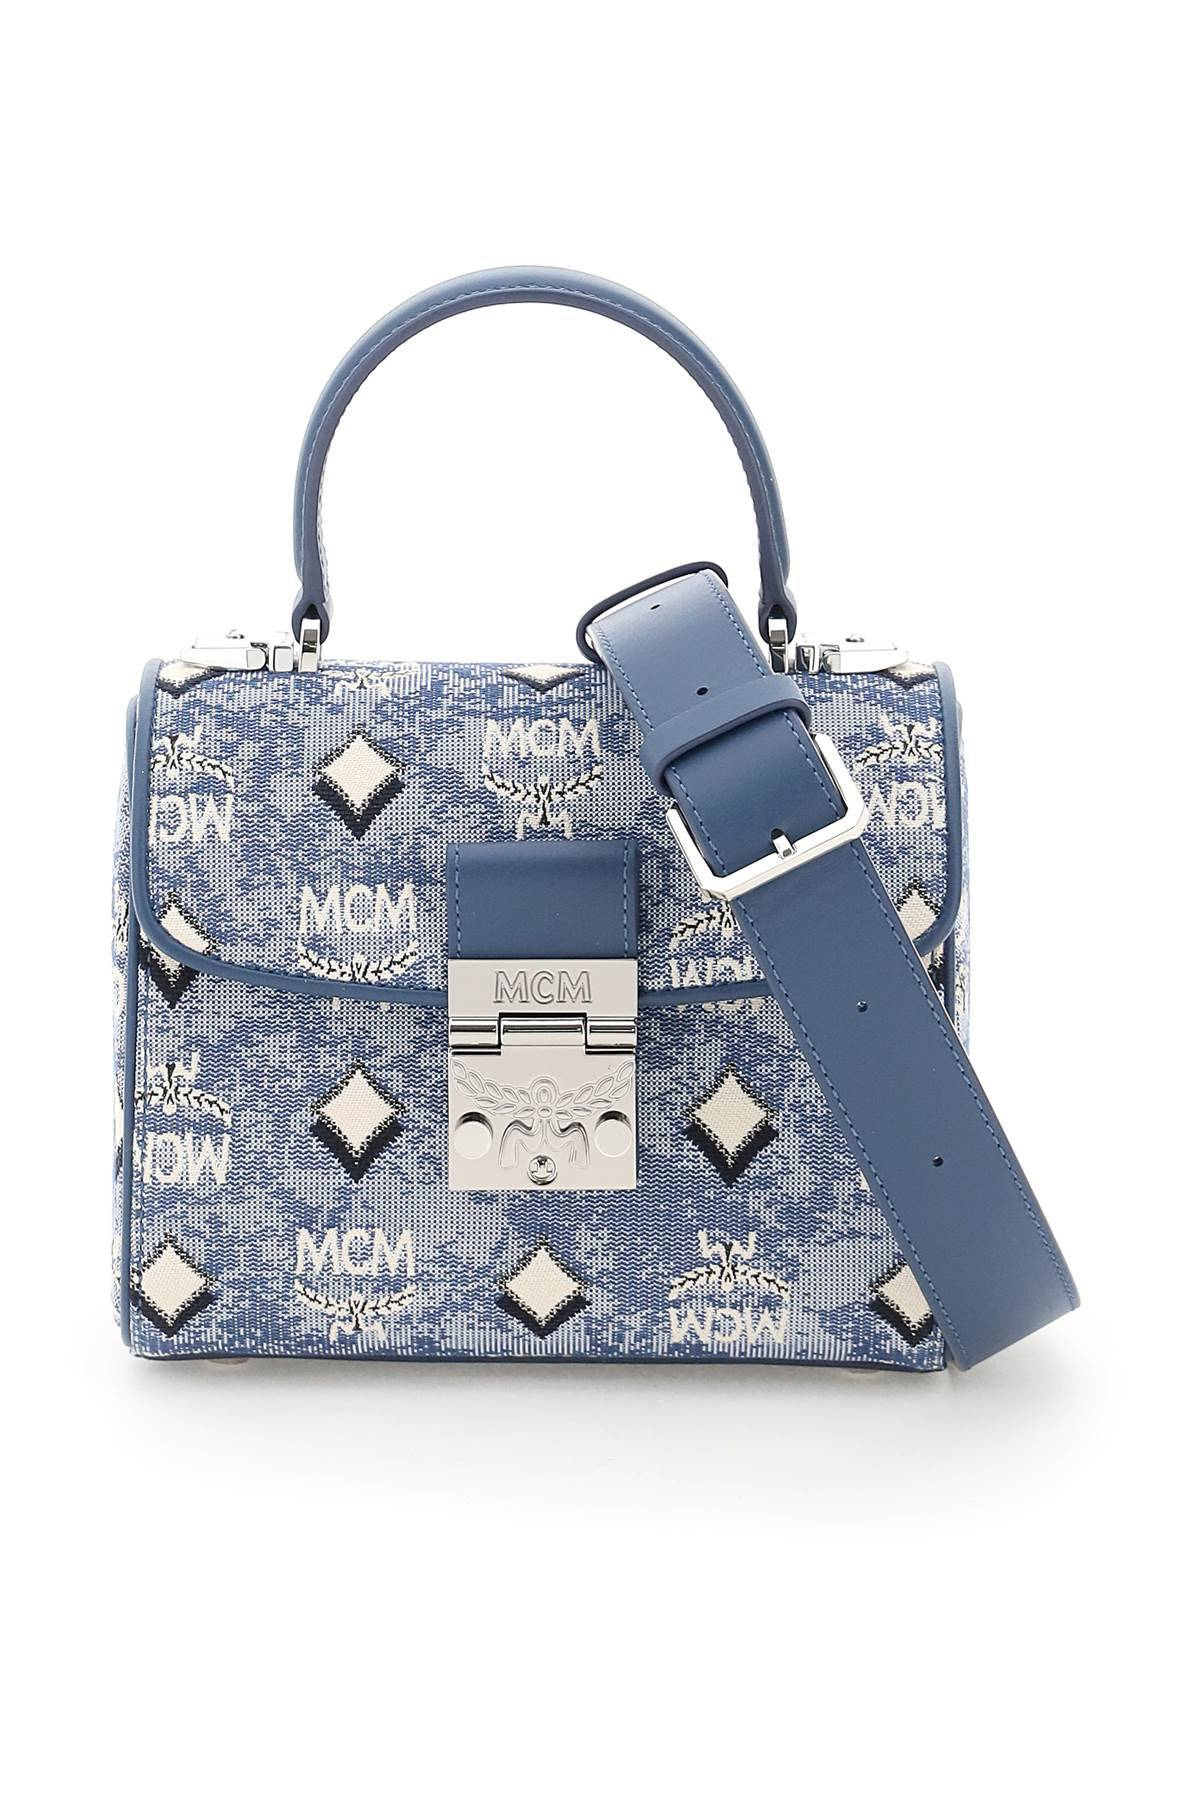 mcm borsa tracy satchel in jacquard vintage monogram os blu, grigio, nero cotone, pelle